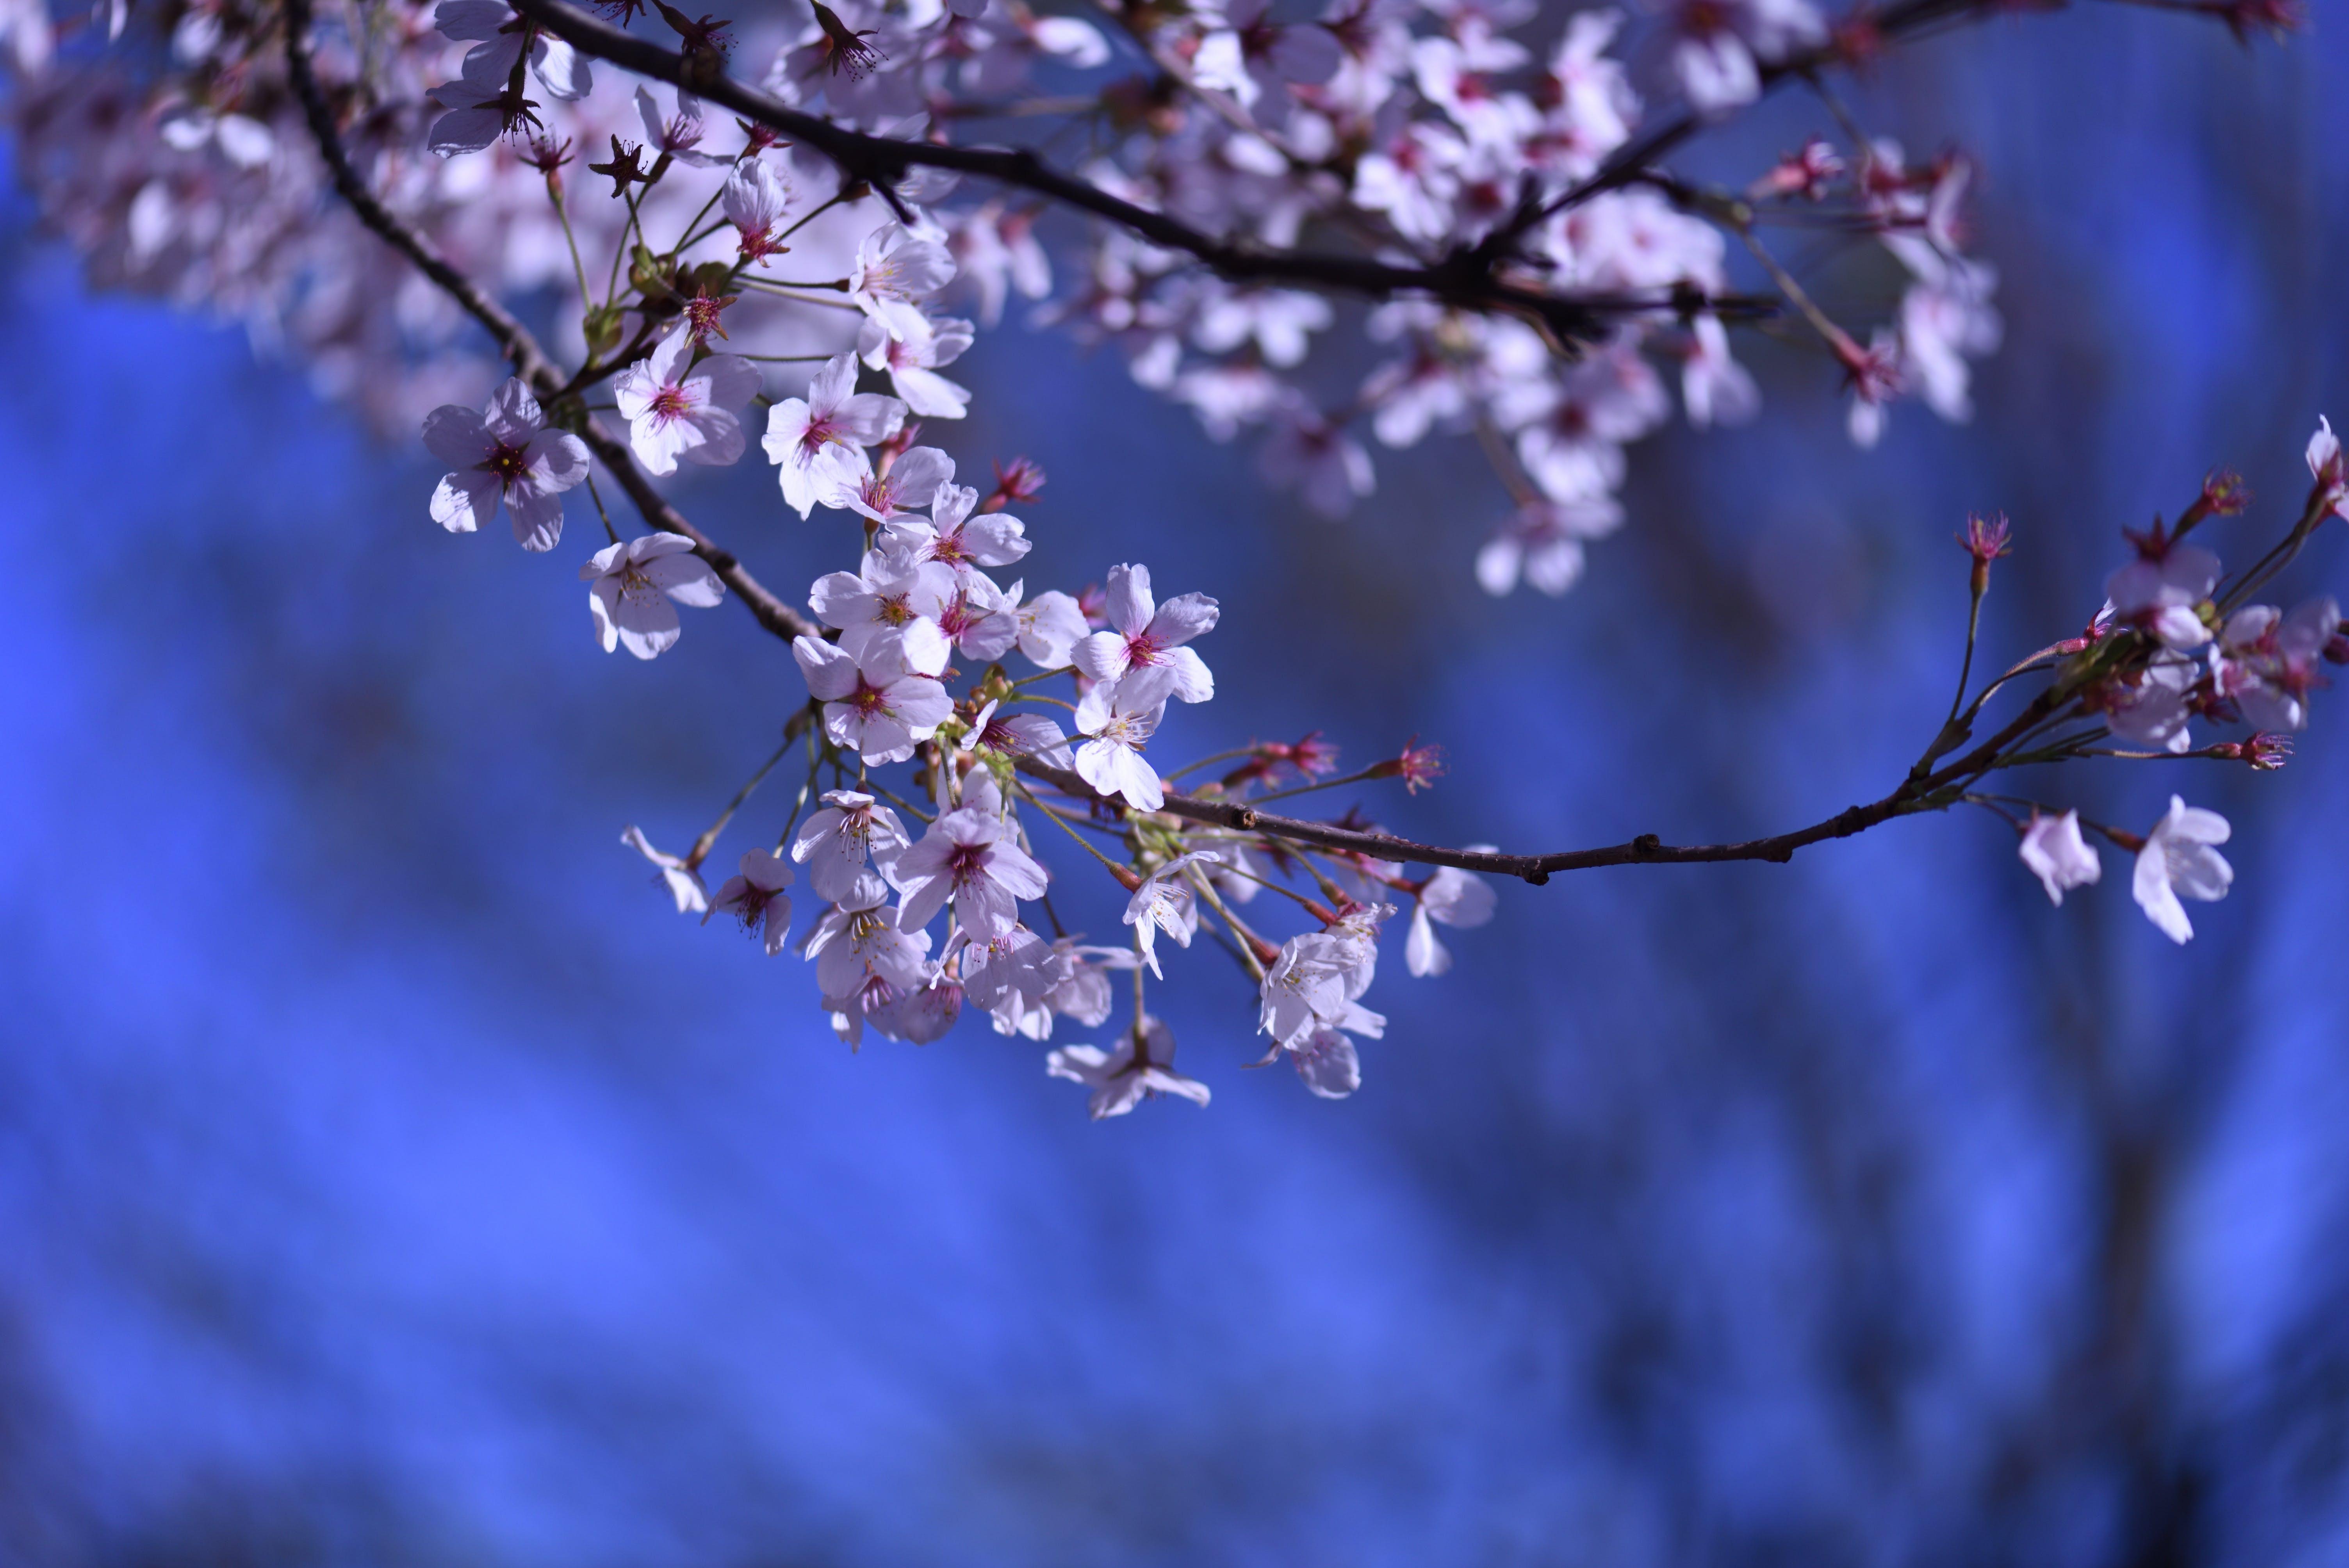 Free stock photo of background image, backgrounds, beautiful flowers, blue